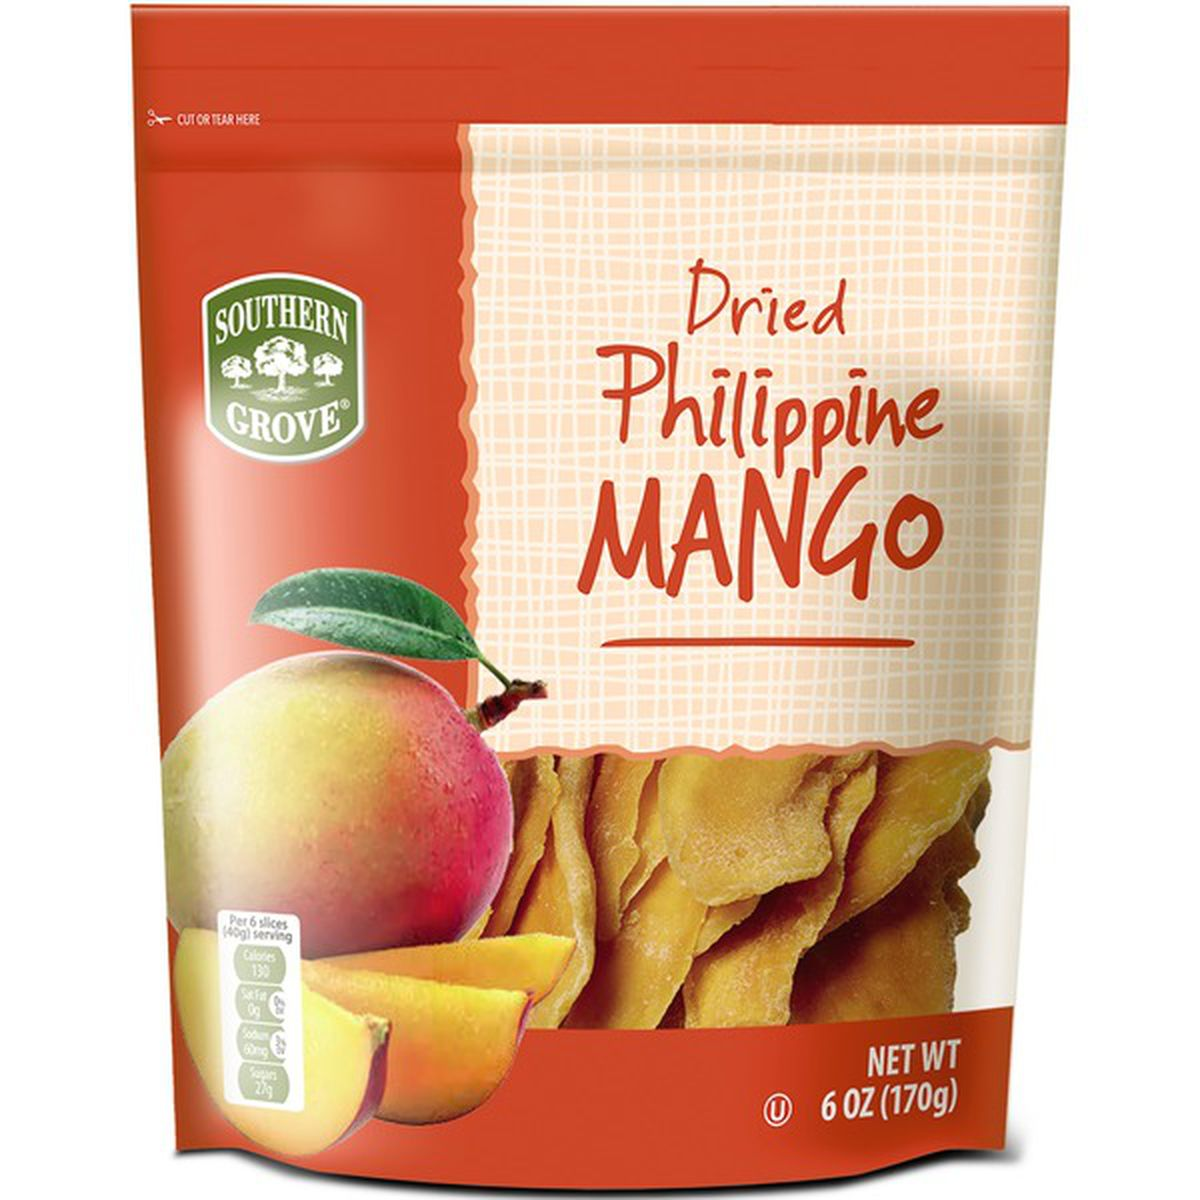 Dried Philippine Mango